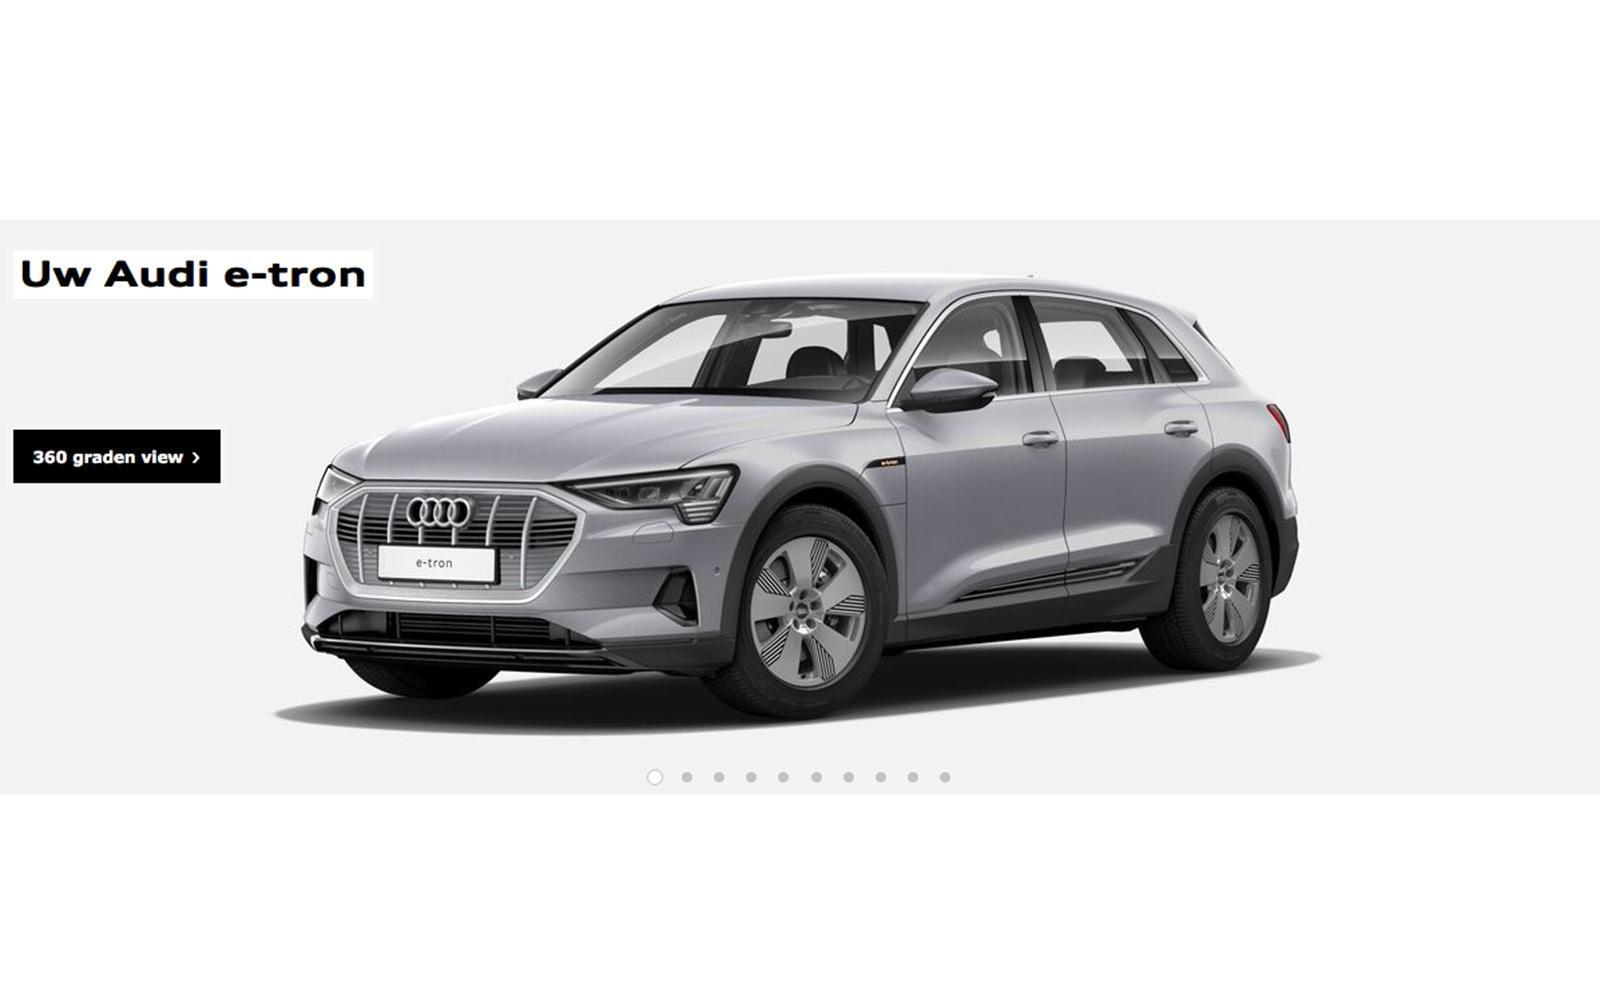 Audi E-tron online configurator